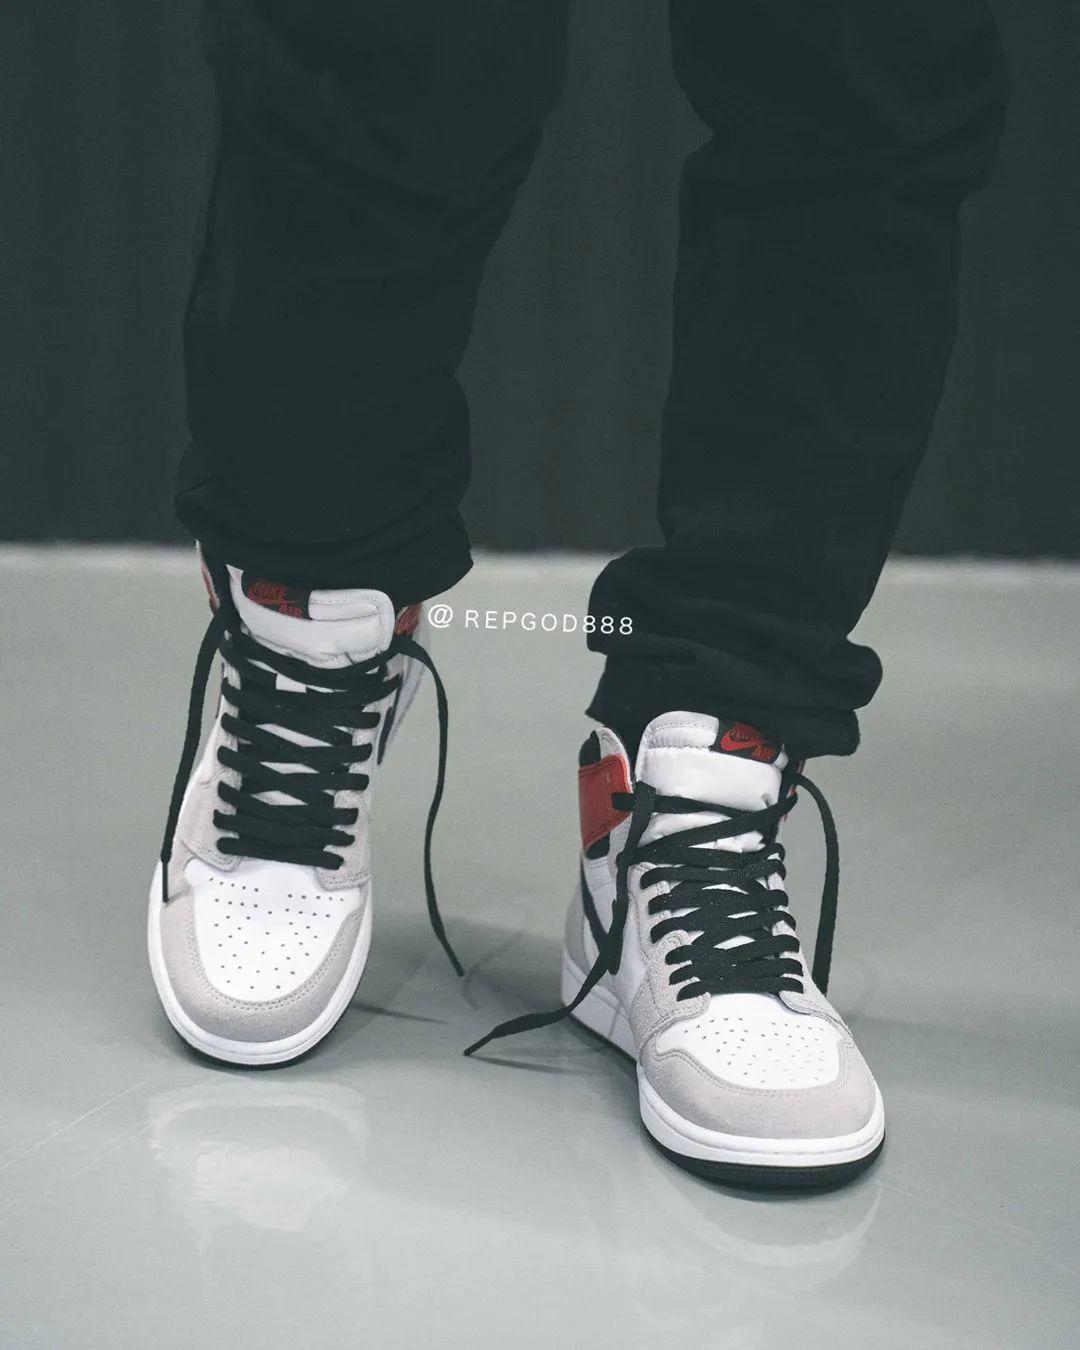 Air Jordan 1拼接小Union烟屁配色提前上脚,确认限量发售!